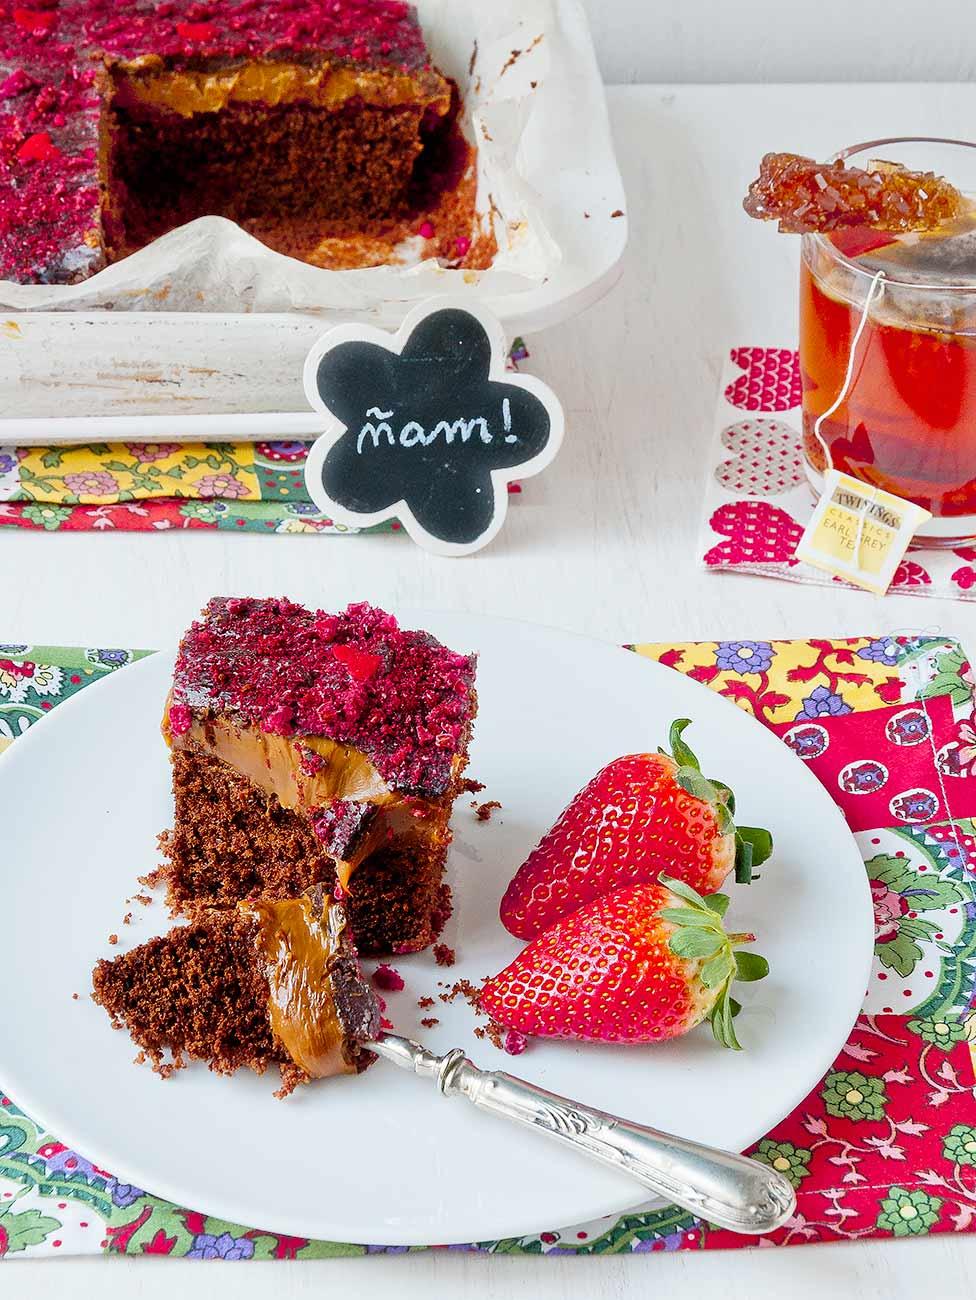 tarta, chocolate, dulce de leche